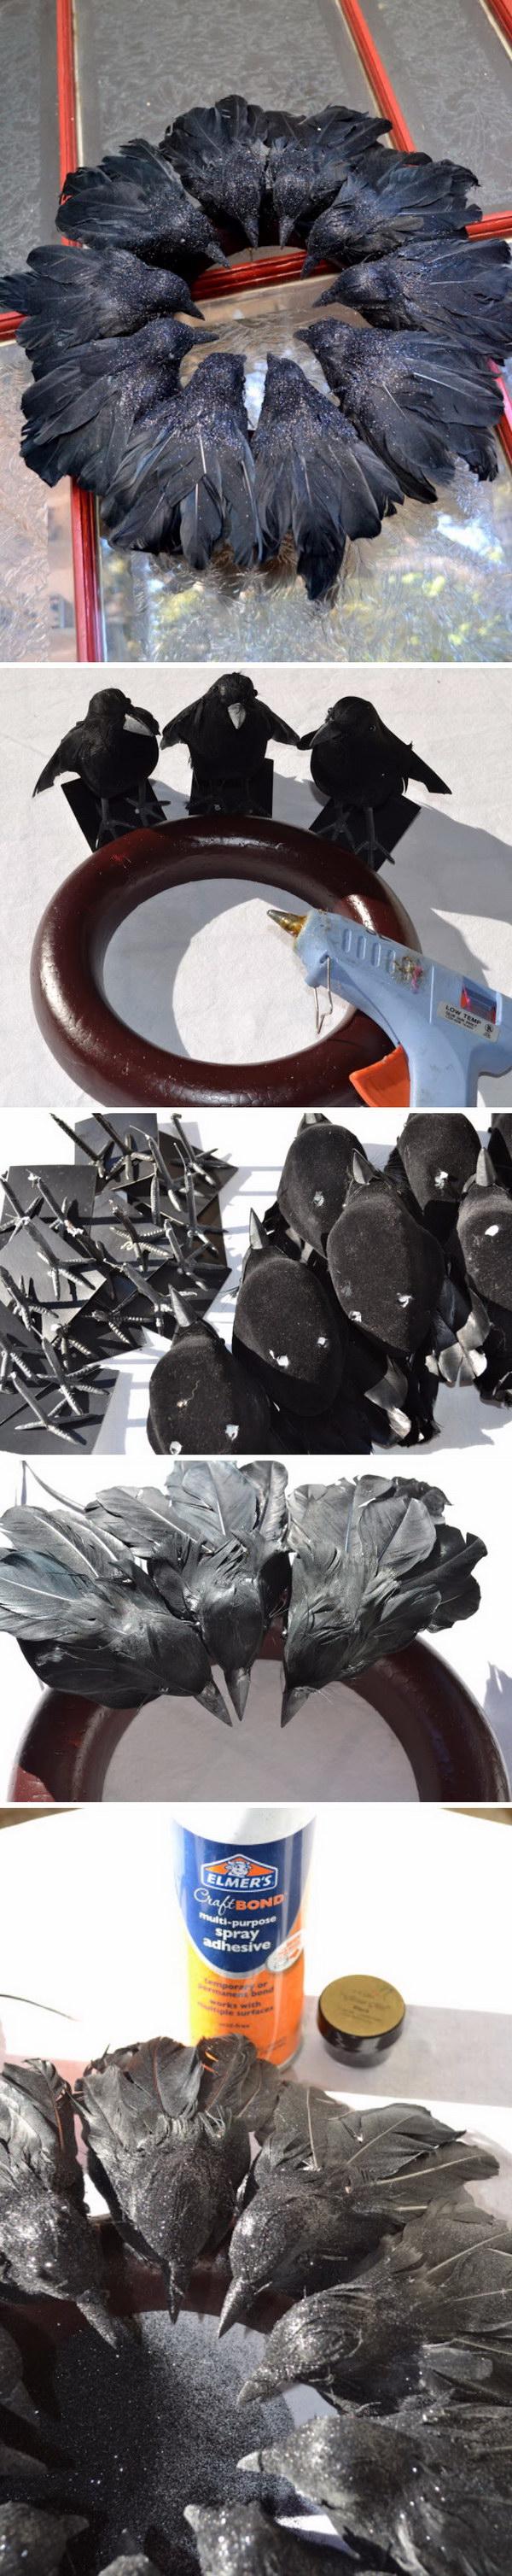 DIY Elegant Raven Wreath from Dollar Store Black Birds.